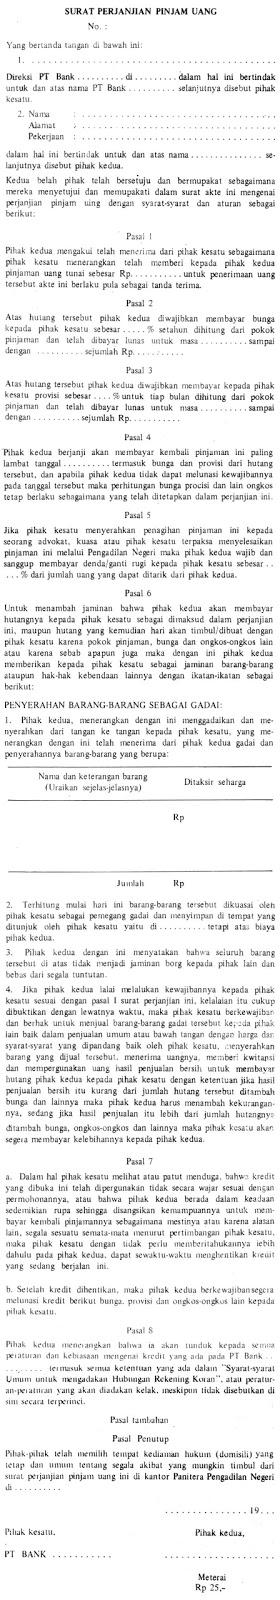 contoh-perjanjian-pinjam-uang